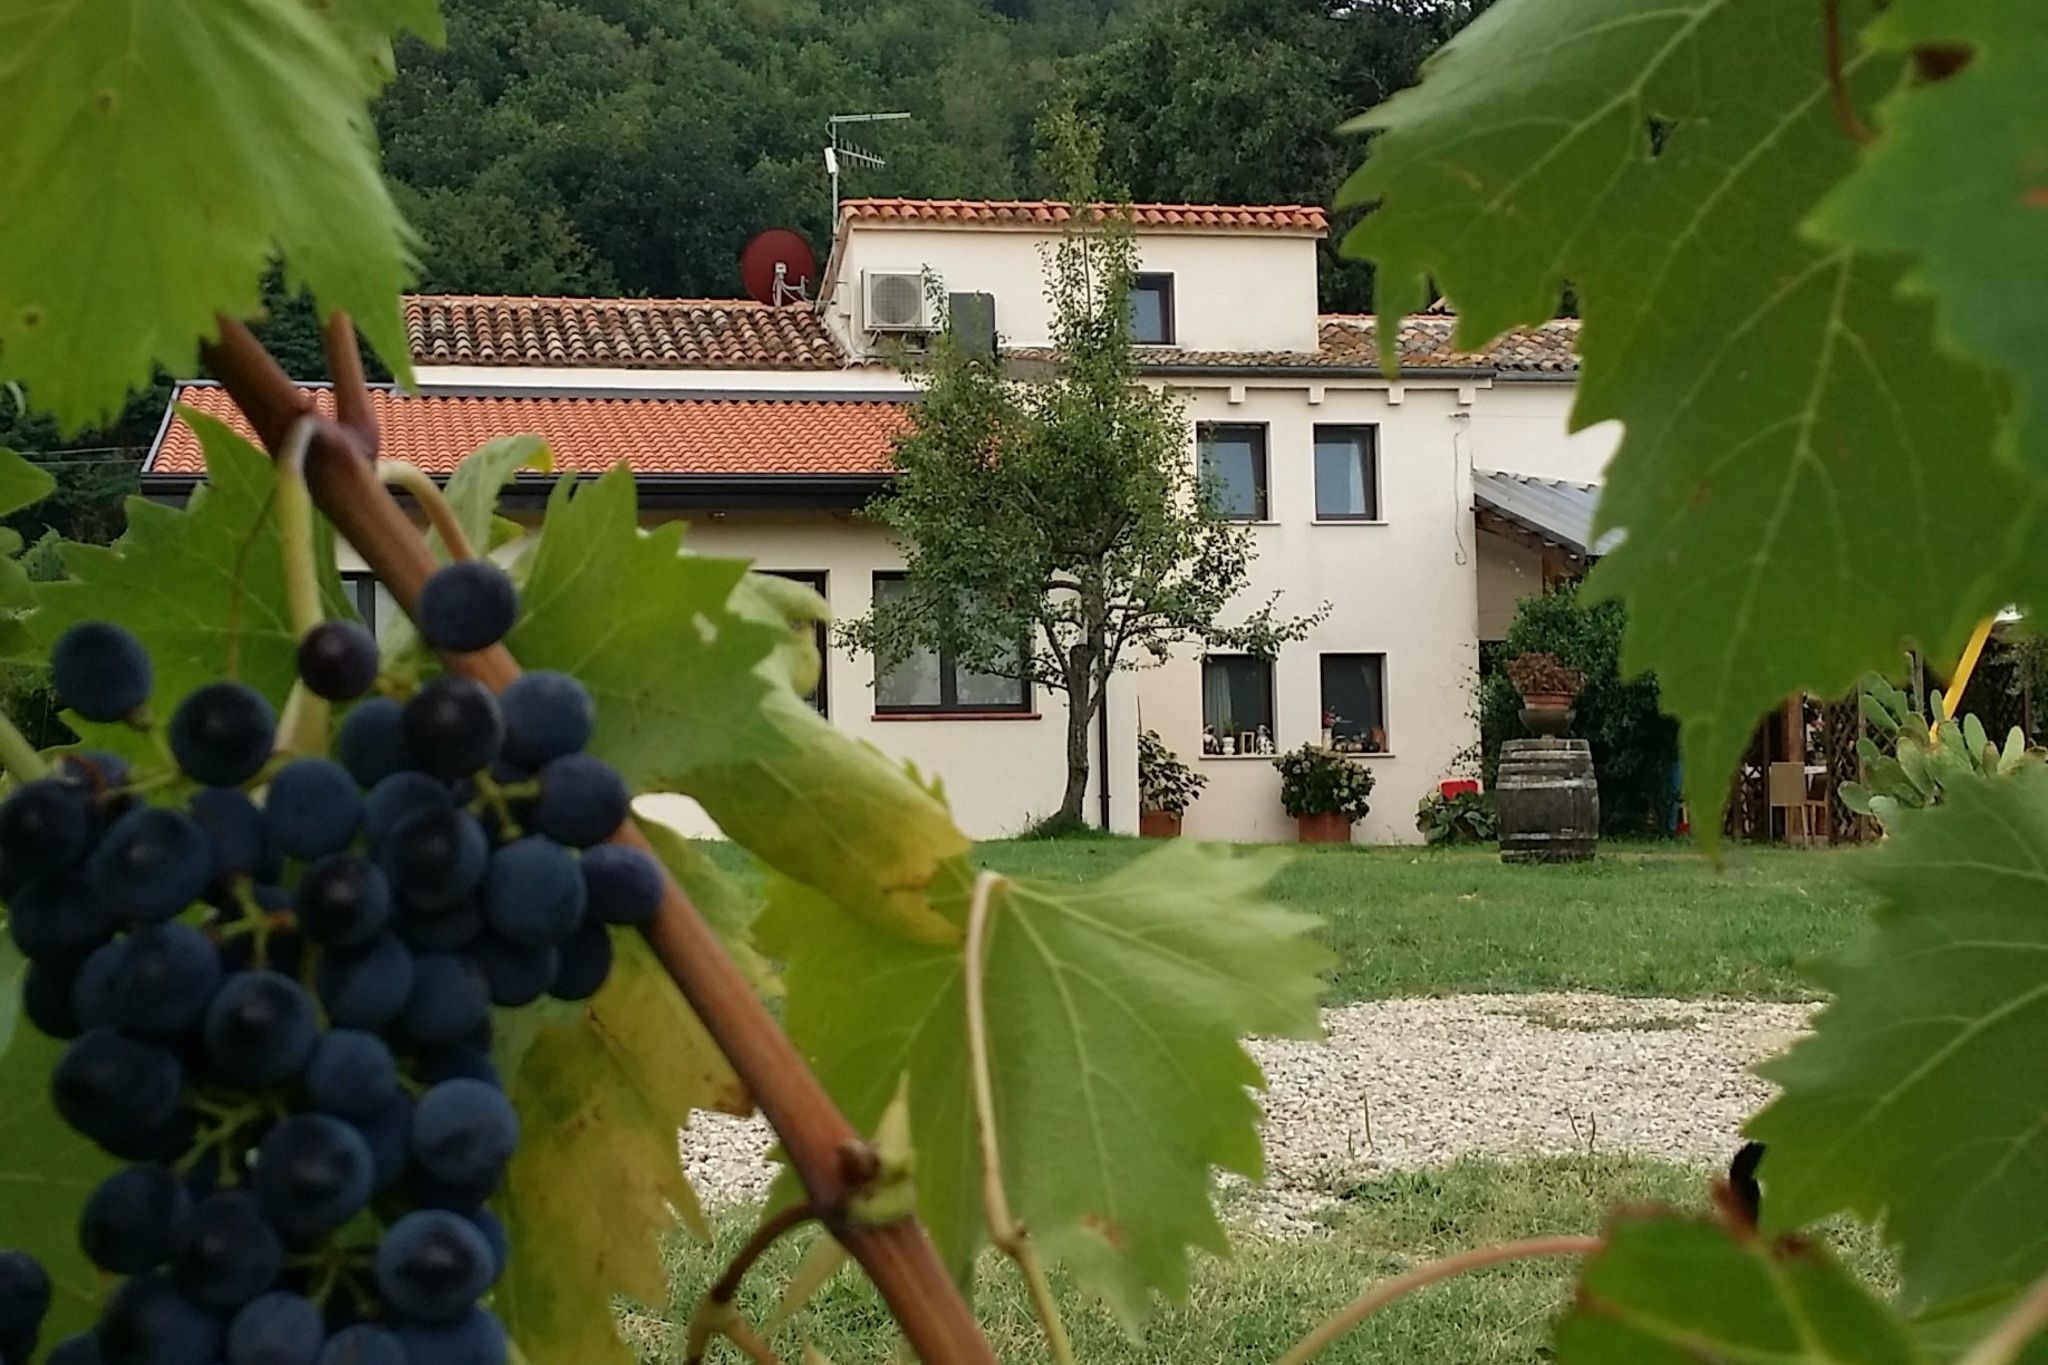 Appartement moderne avec piscine à Gemmano en Italie